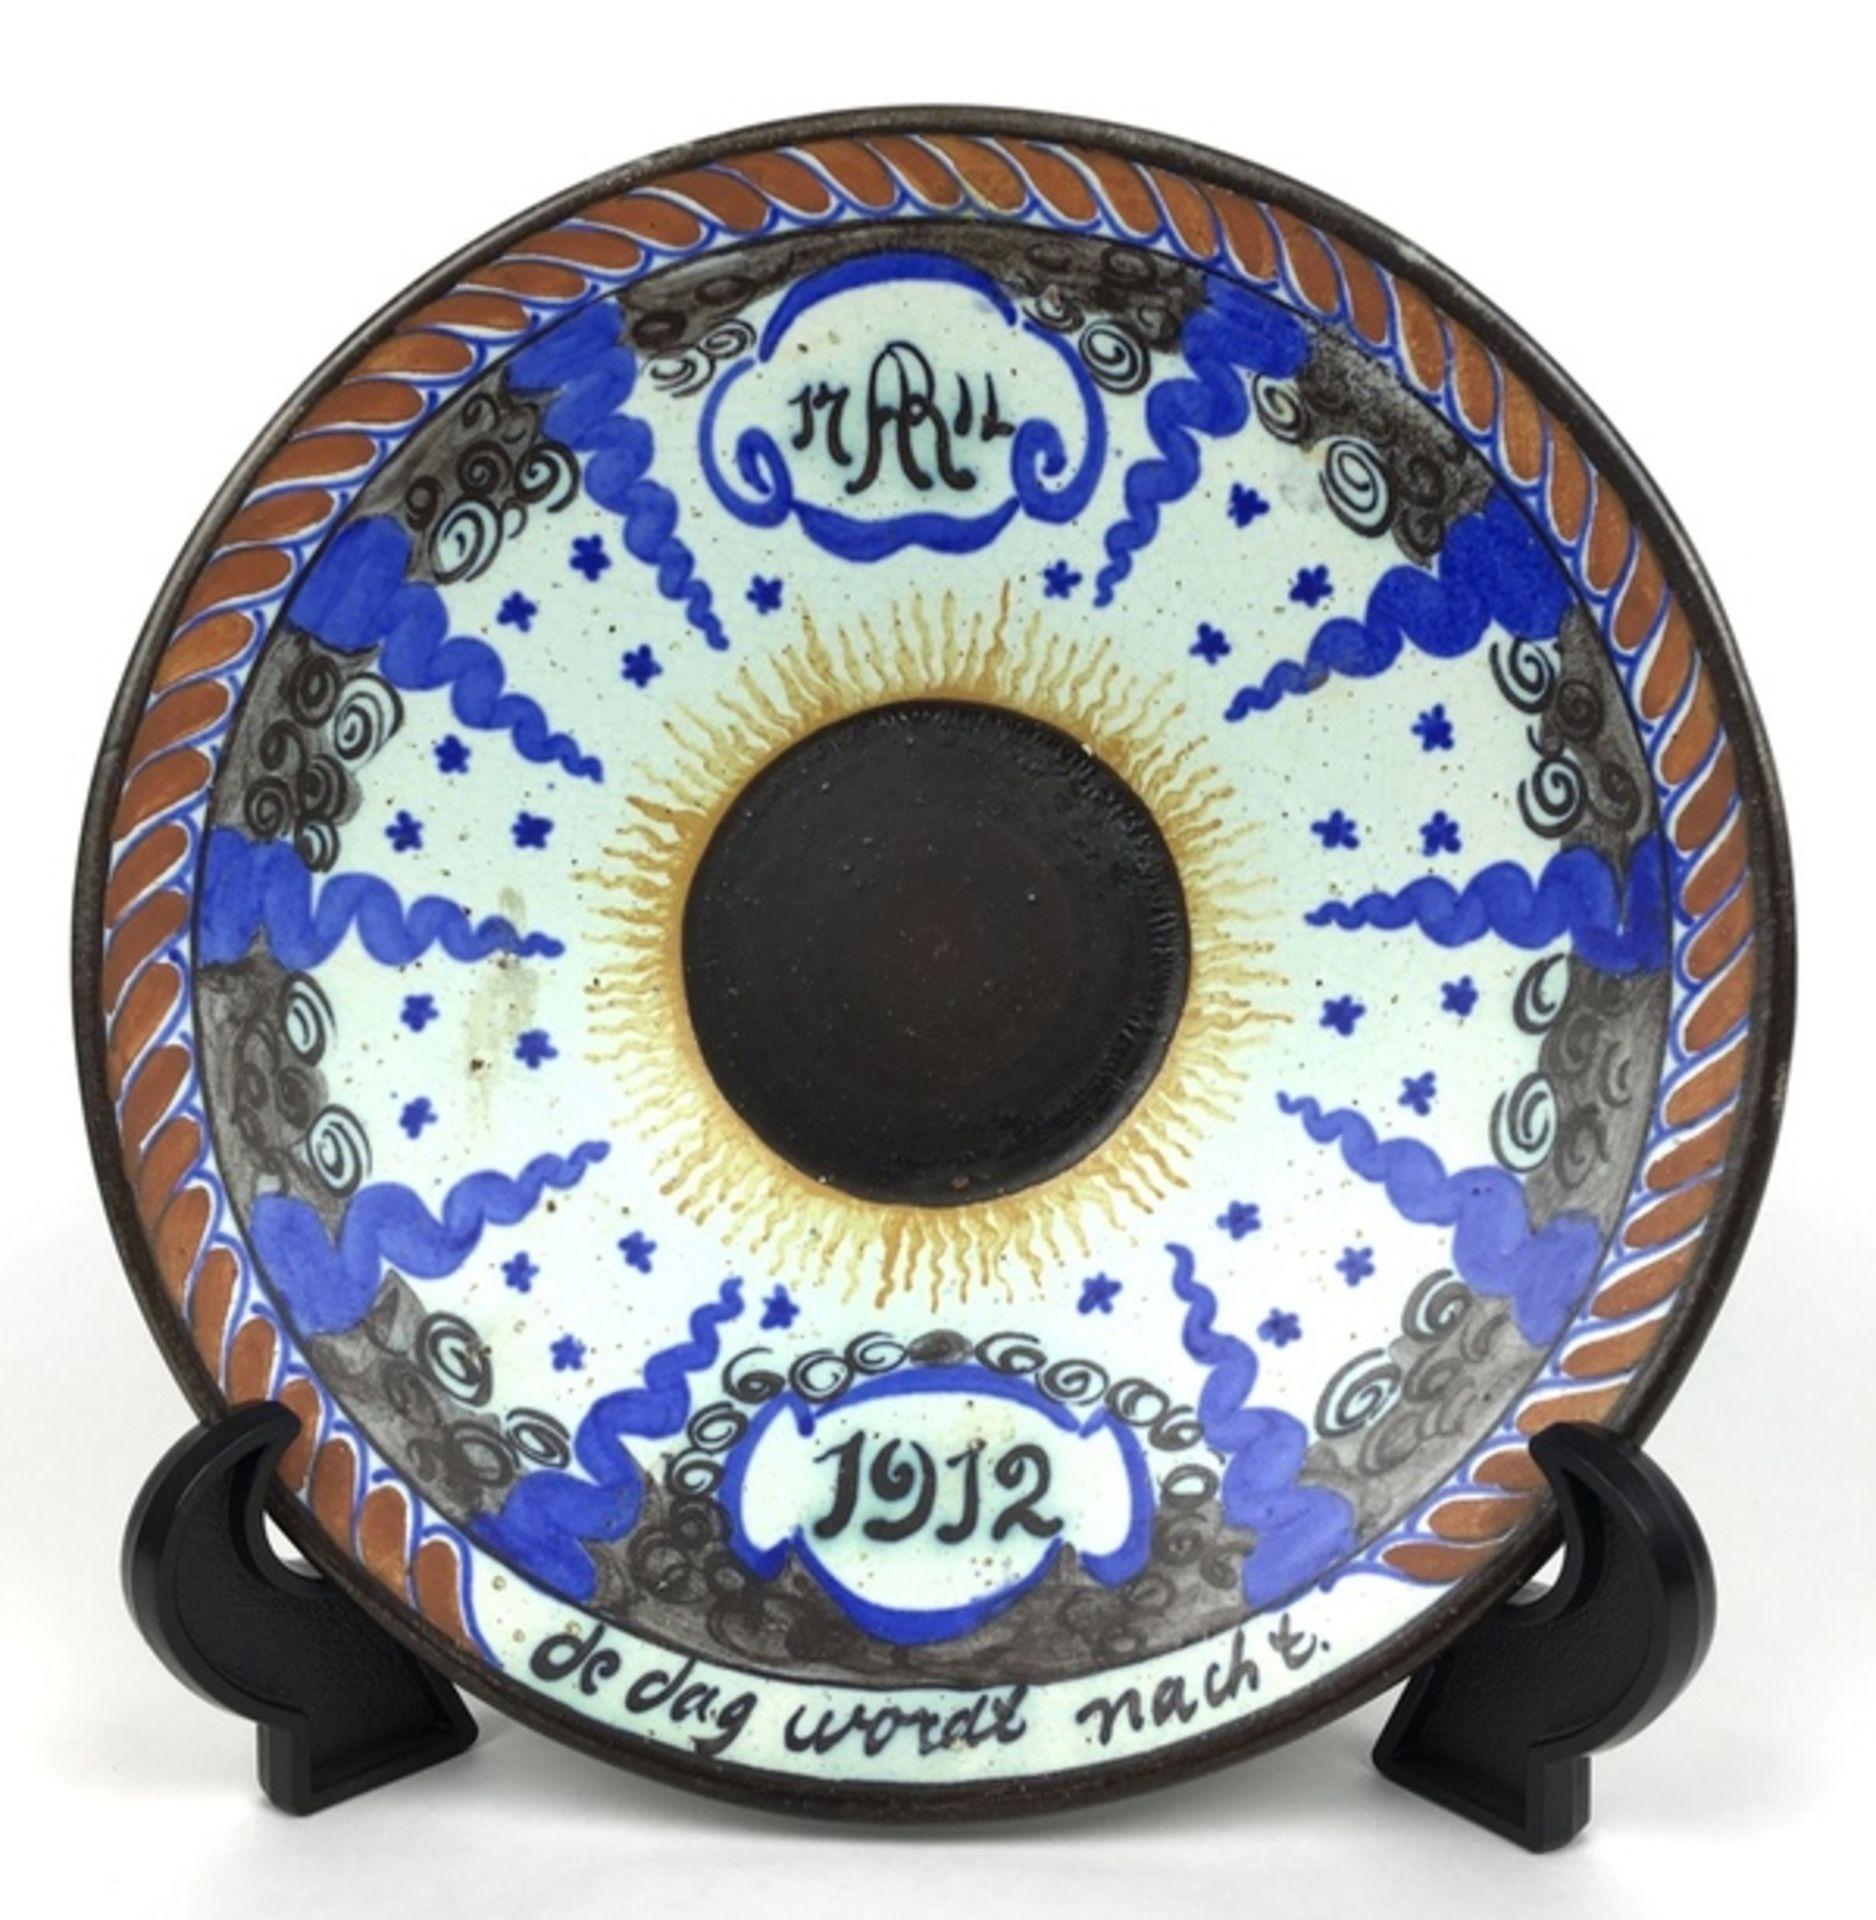 (Toegpaste kunst) Bord, Potterij RembrandtHerinneringsbord zonsverduistering 17 april 1912. Pot